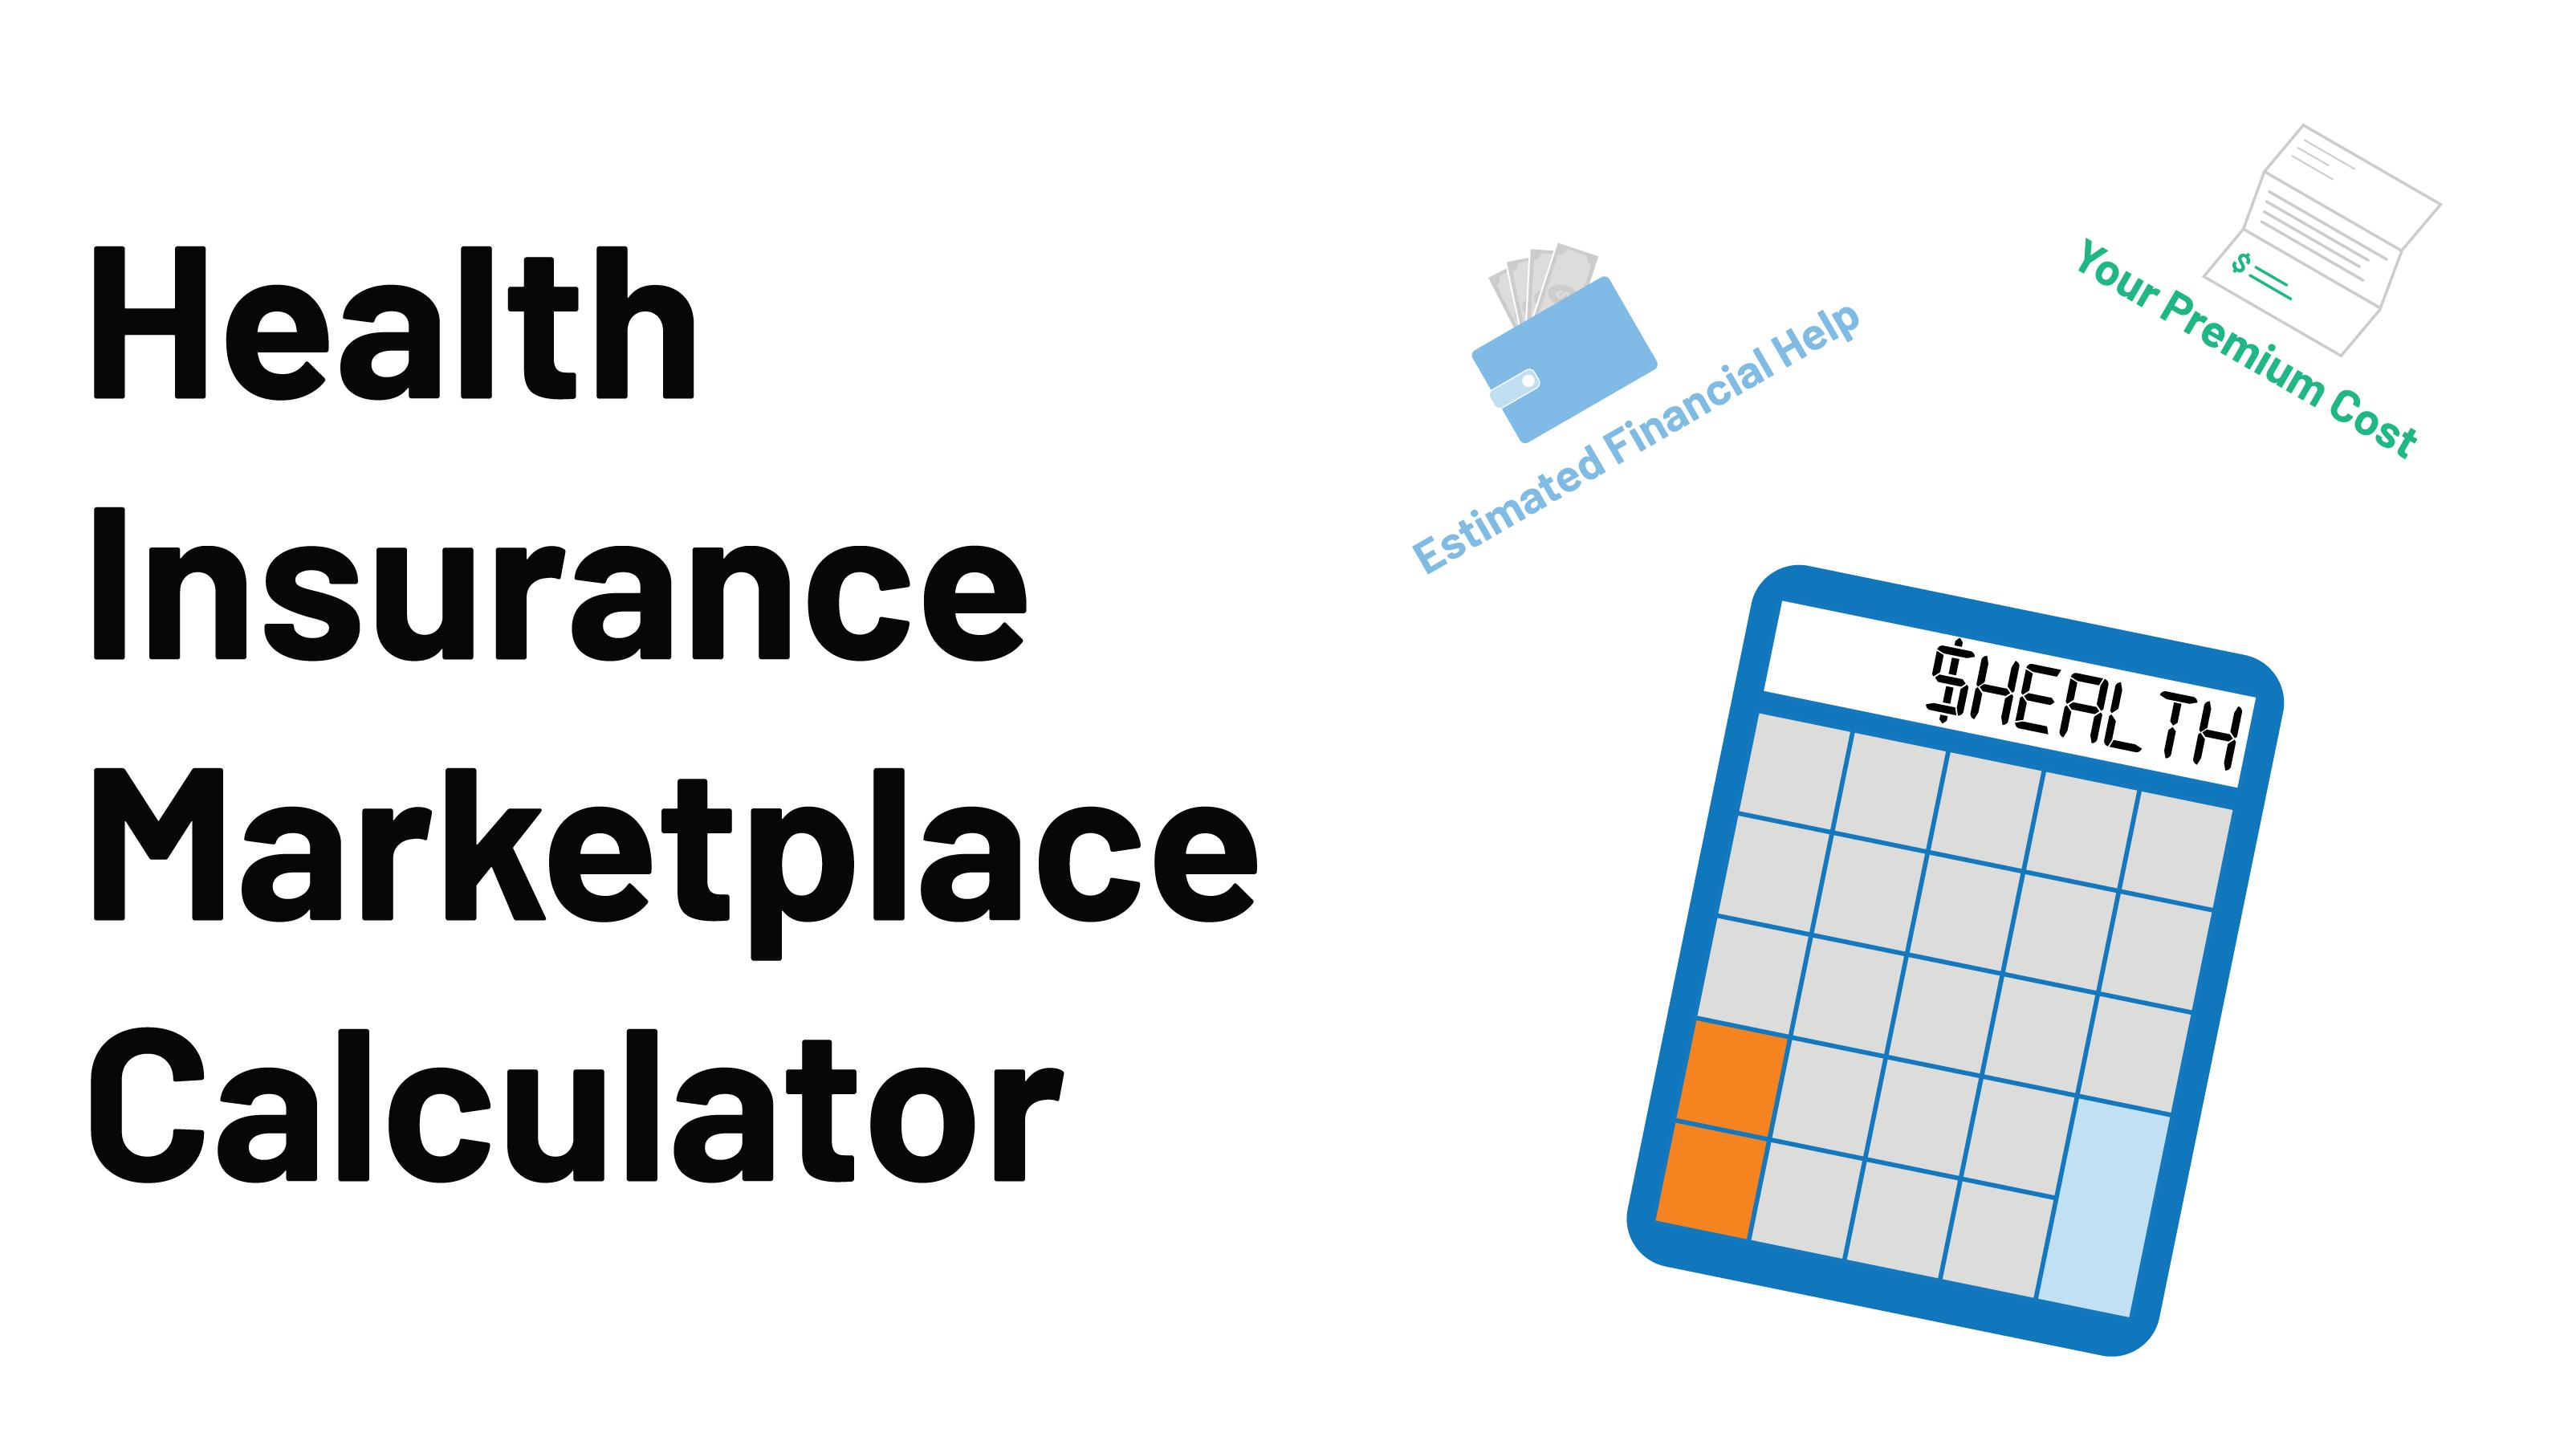 Health Insurance Marketplace Calculator Kff In 2021 Marketplace Health Insurance Health Insurance Insurance